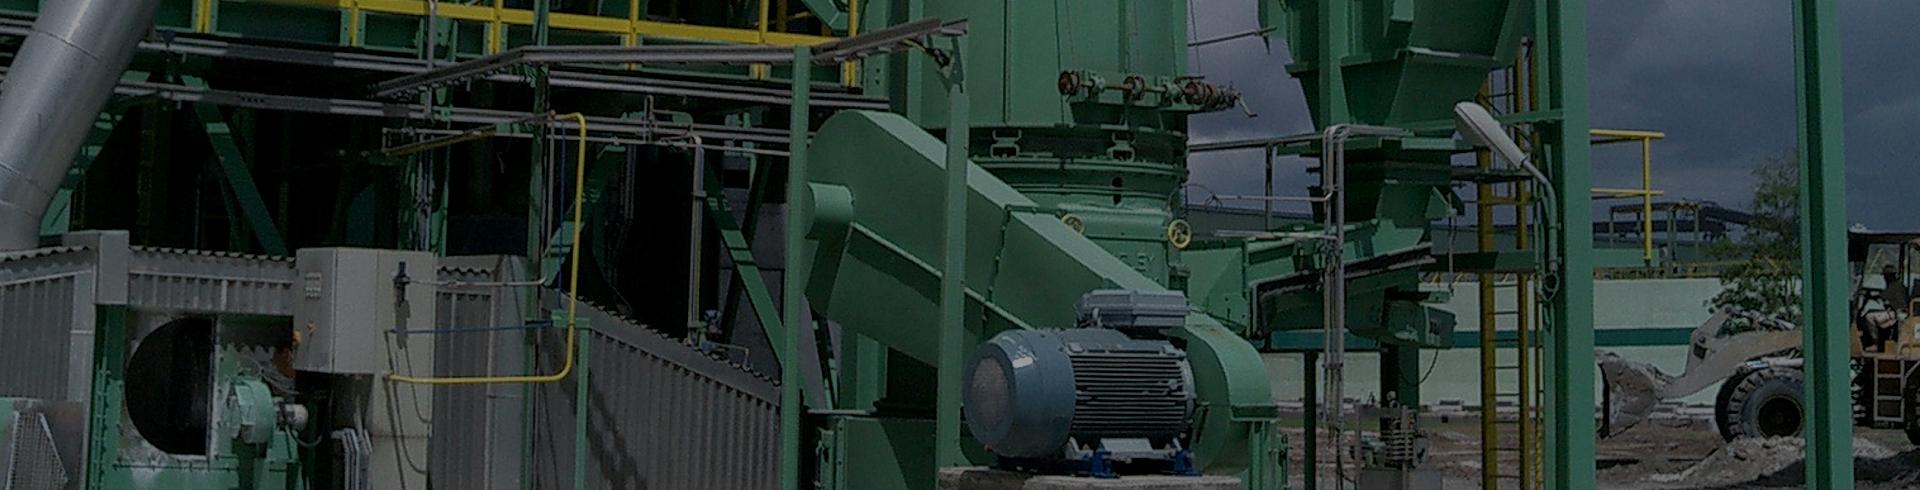 bradley-pulverizer-slide-11